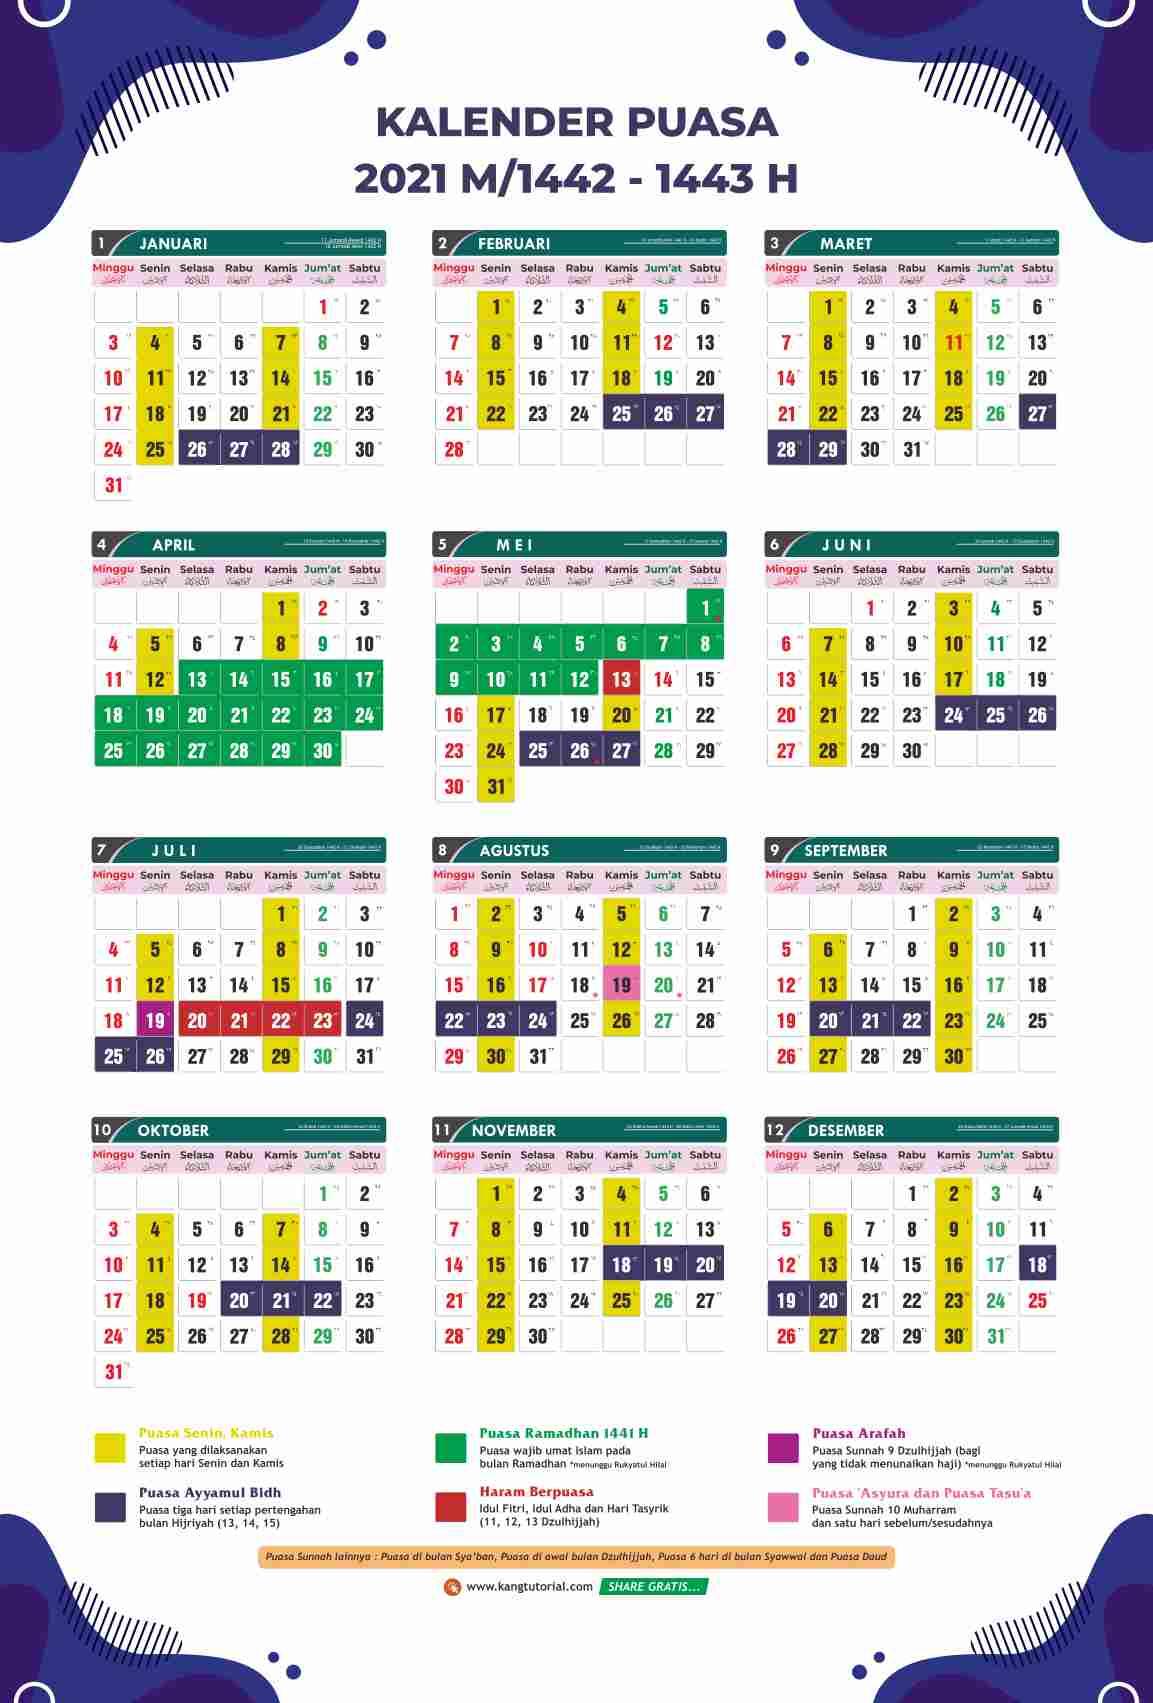 Download Kalender Puasa Tahun 2021